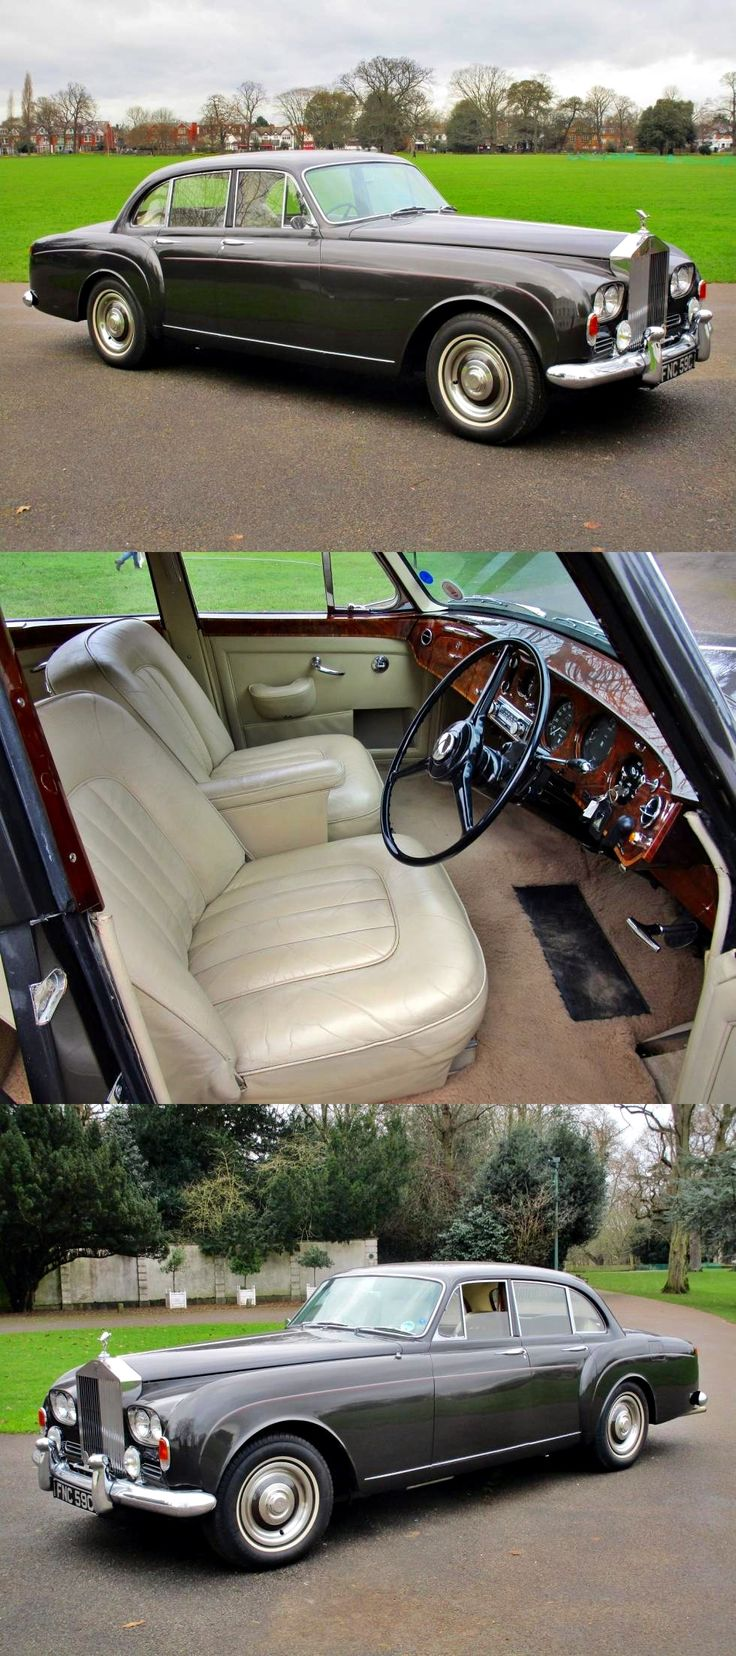 1965 Rolls-Royce Silver Cloud III Saloon                                                                                                                                                                                 Más